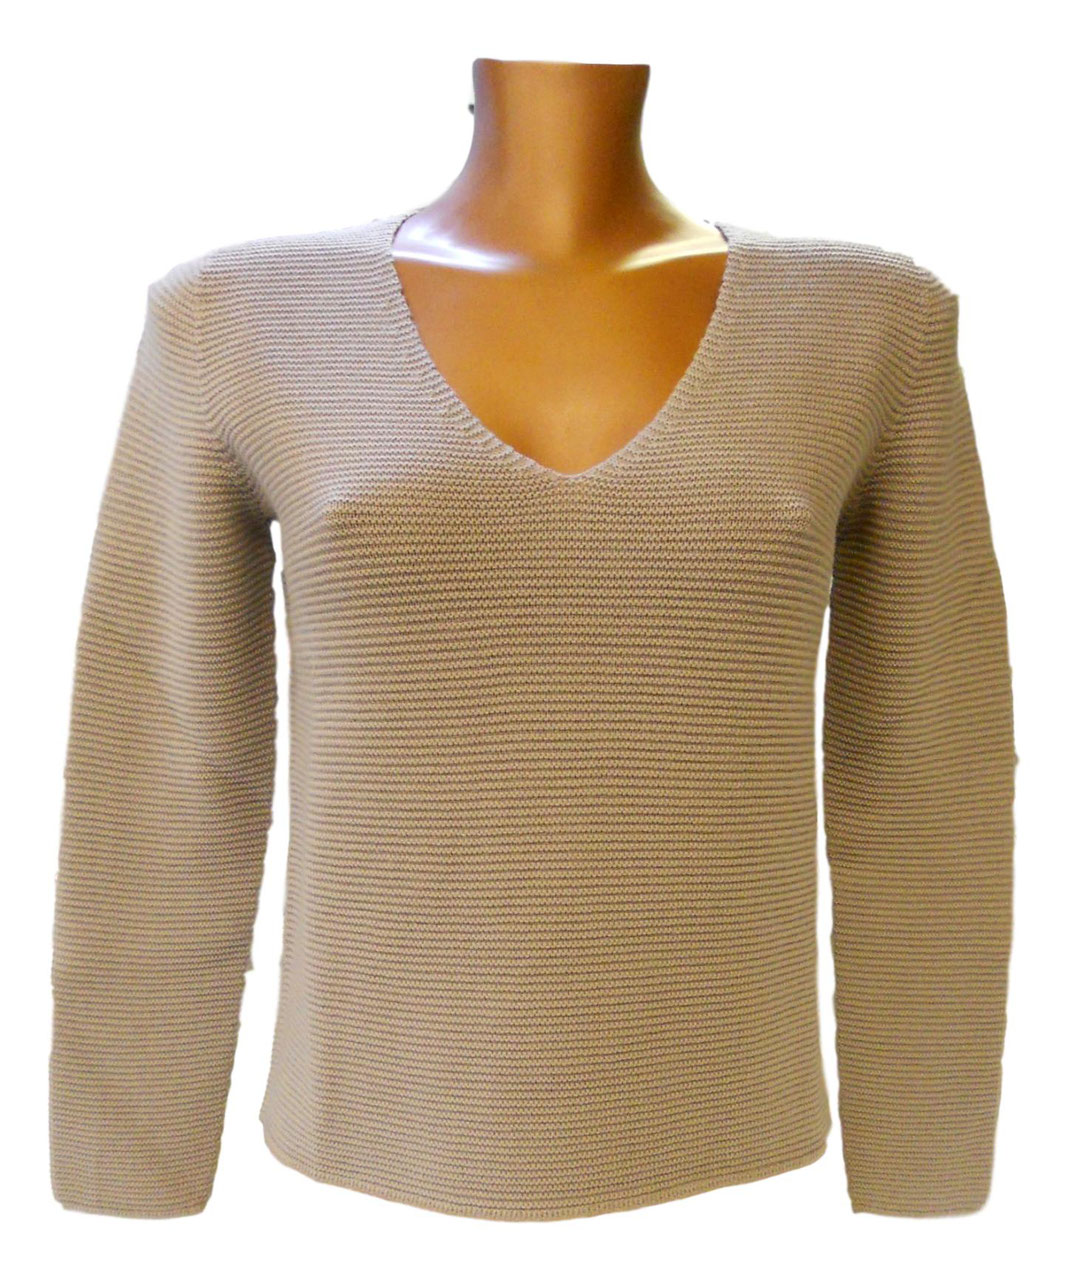 Pullover Lana Merinos Extra Fine - Maglieria Camiceria Bellucci. b8b44d4c63c